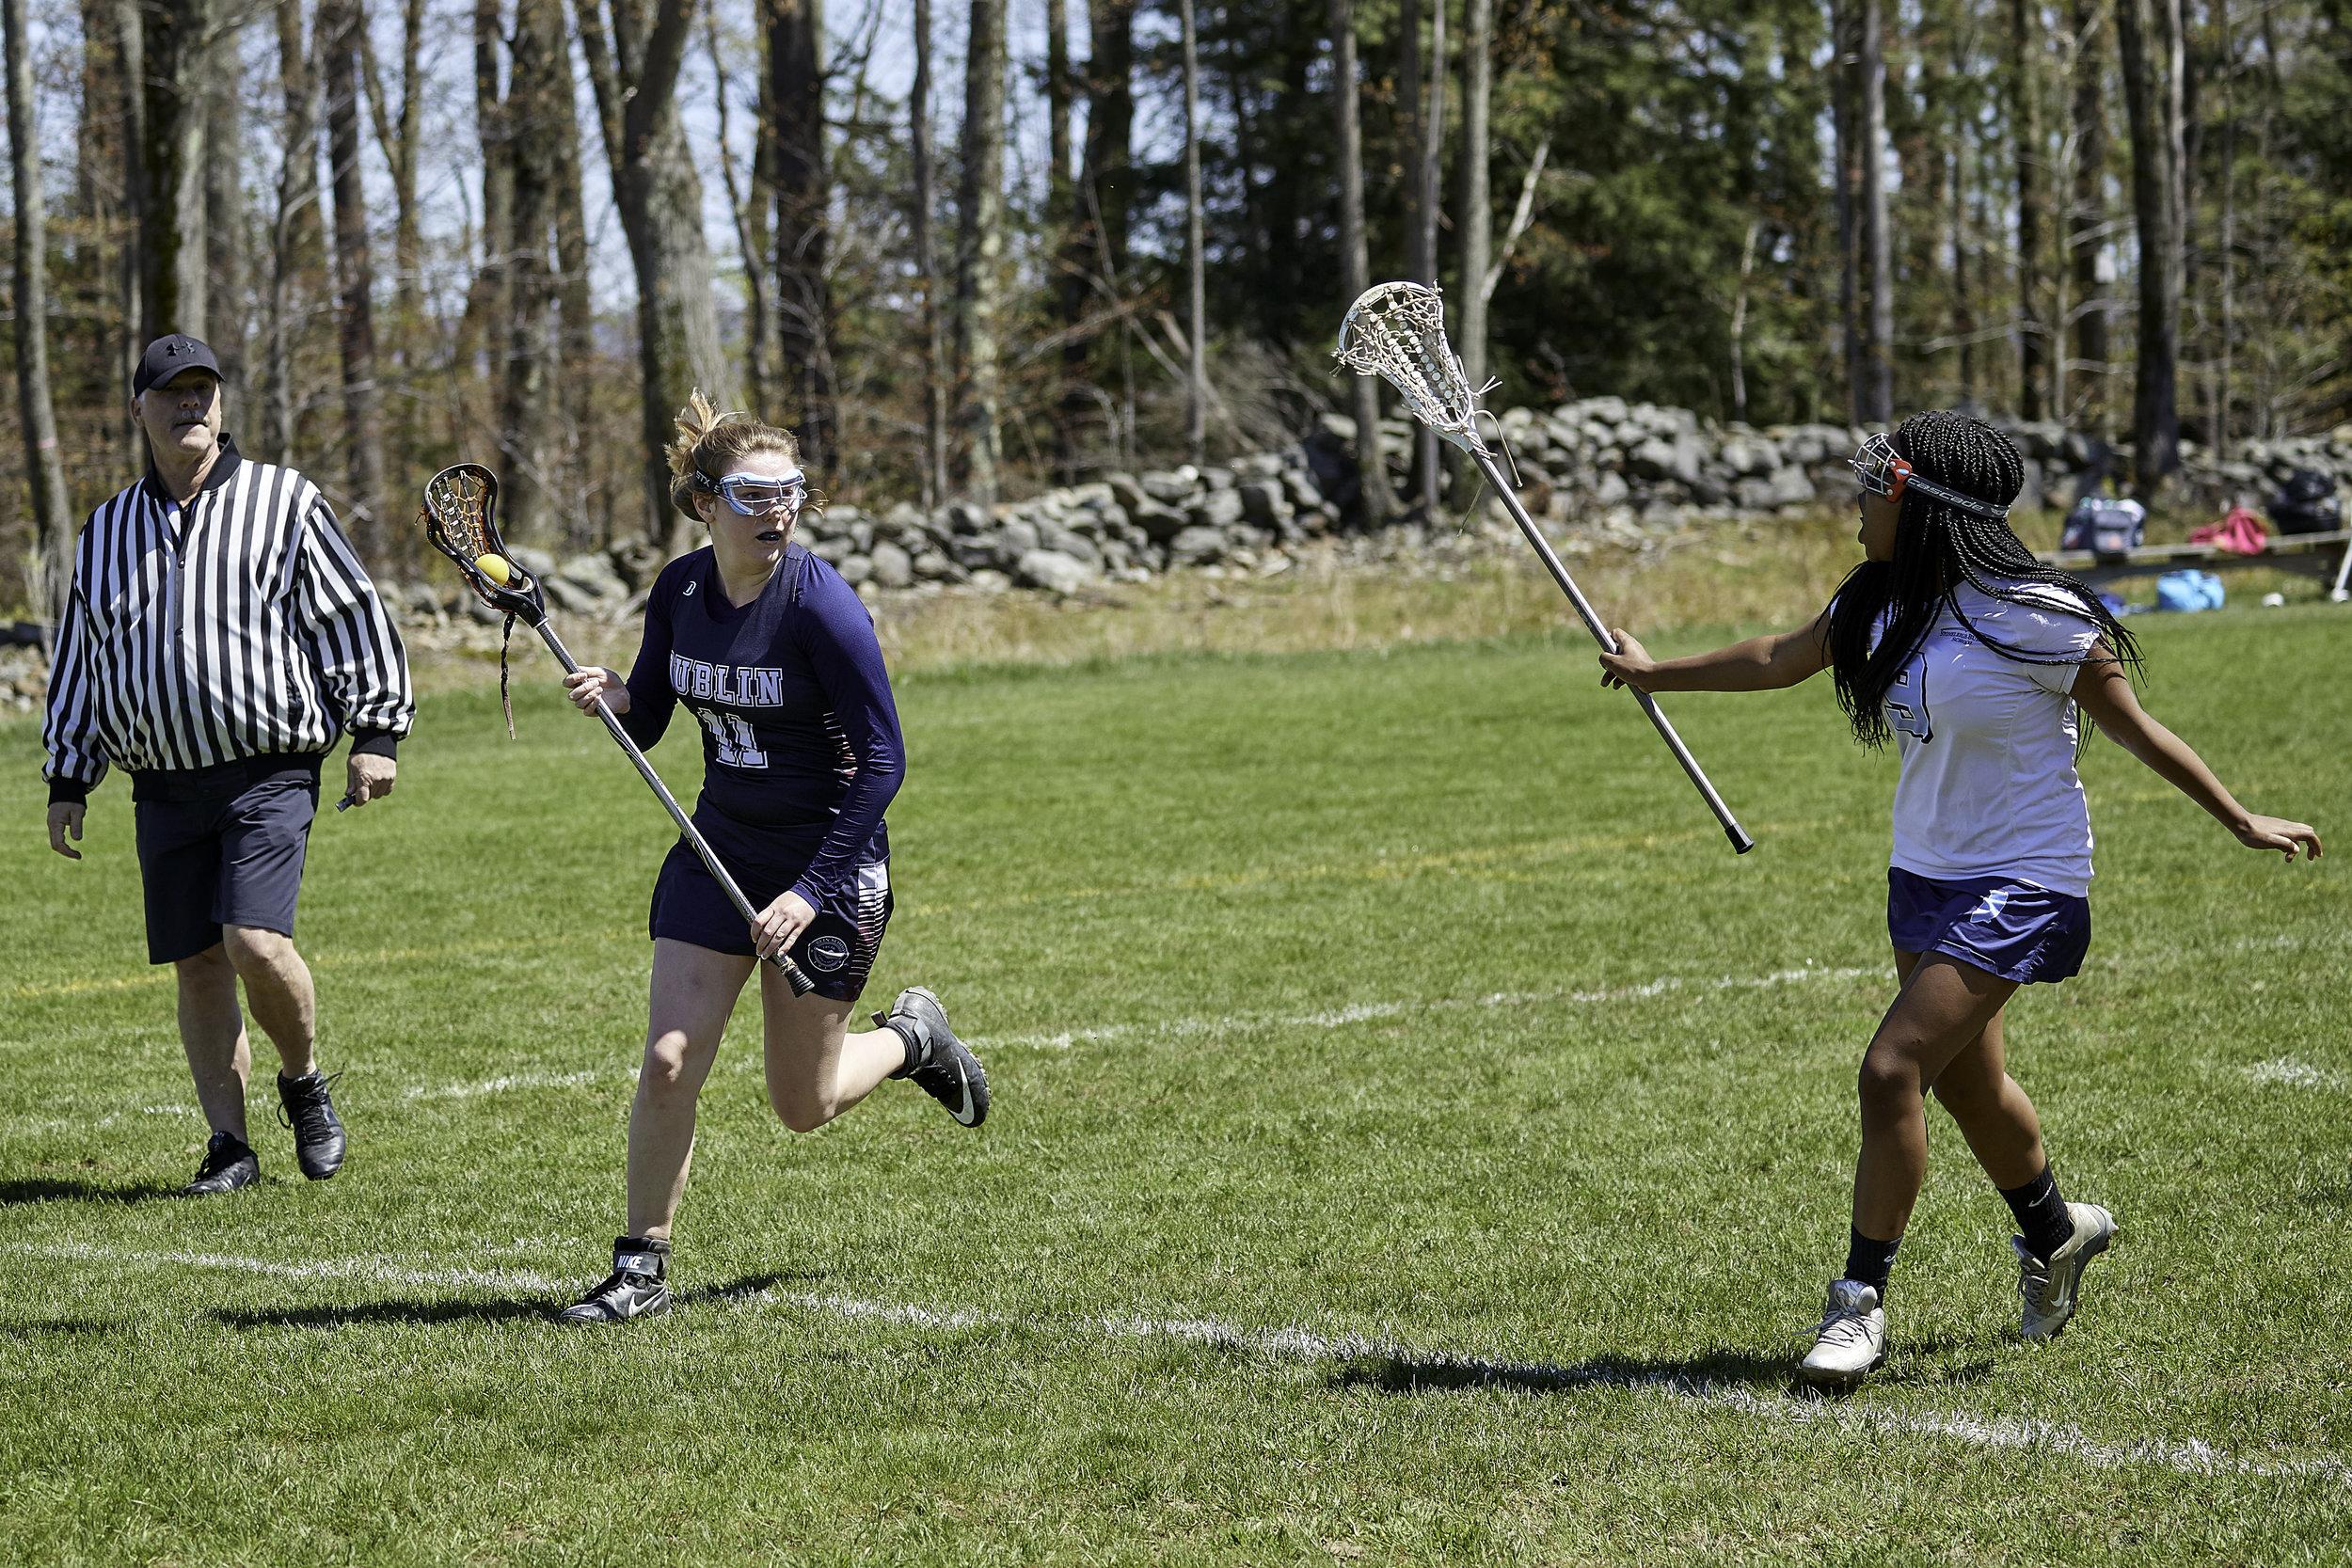 Girls Lacrosse vs. Stoneleigh Burnham School - May 11, 2019 - May 10, 2019193207.jpg